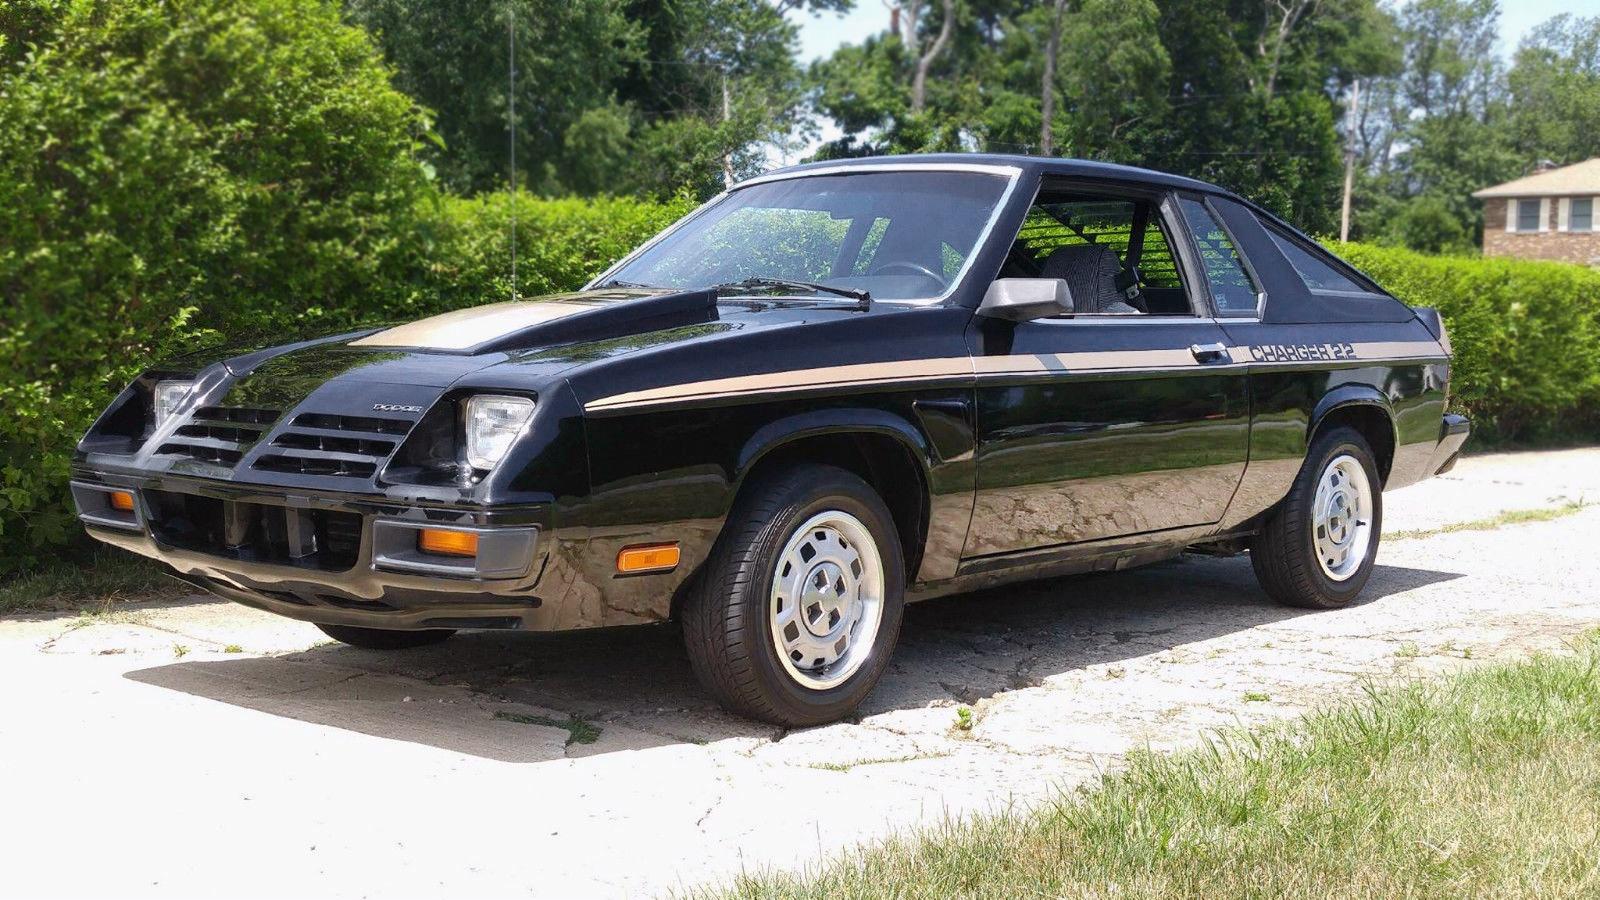 399 Omni 024 Option 1981 Dodge Charger 2 2